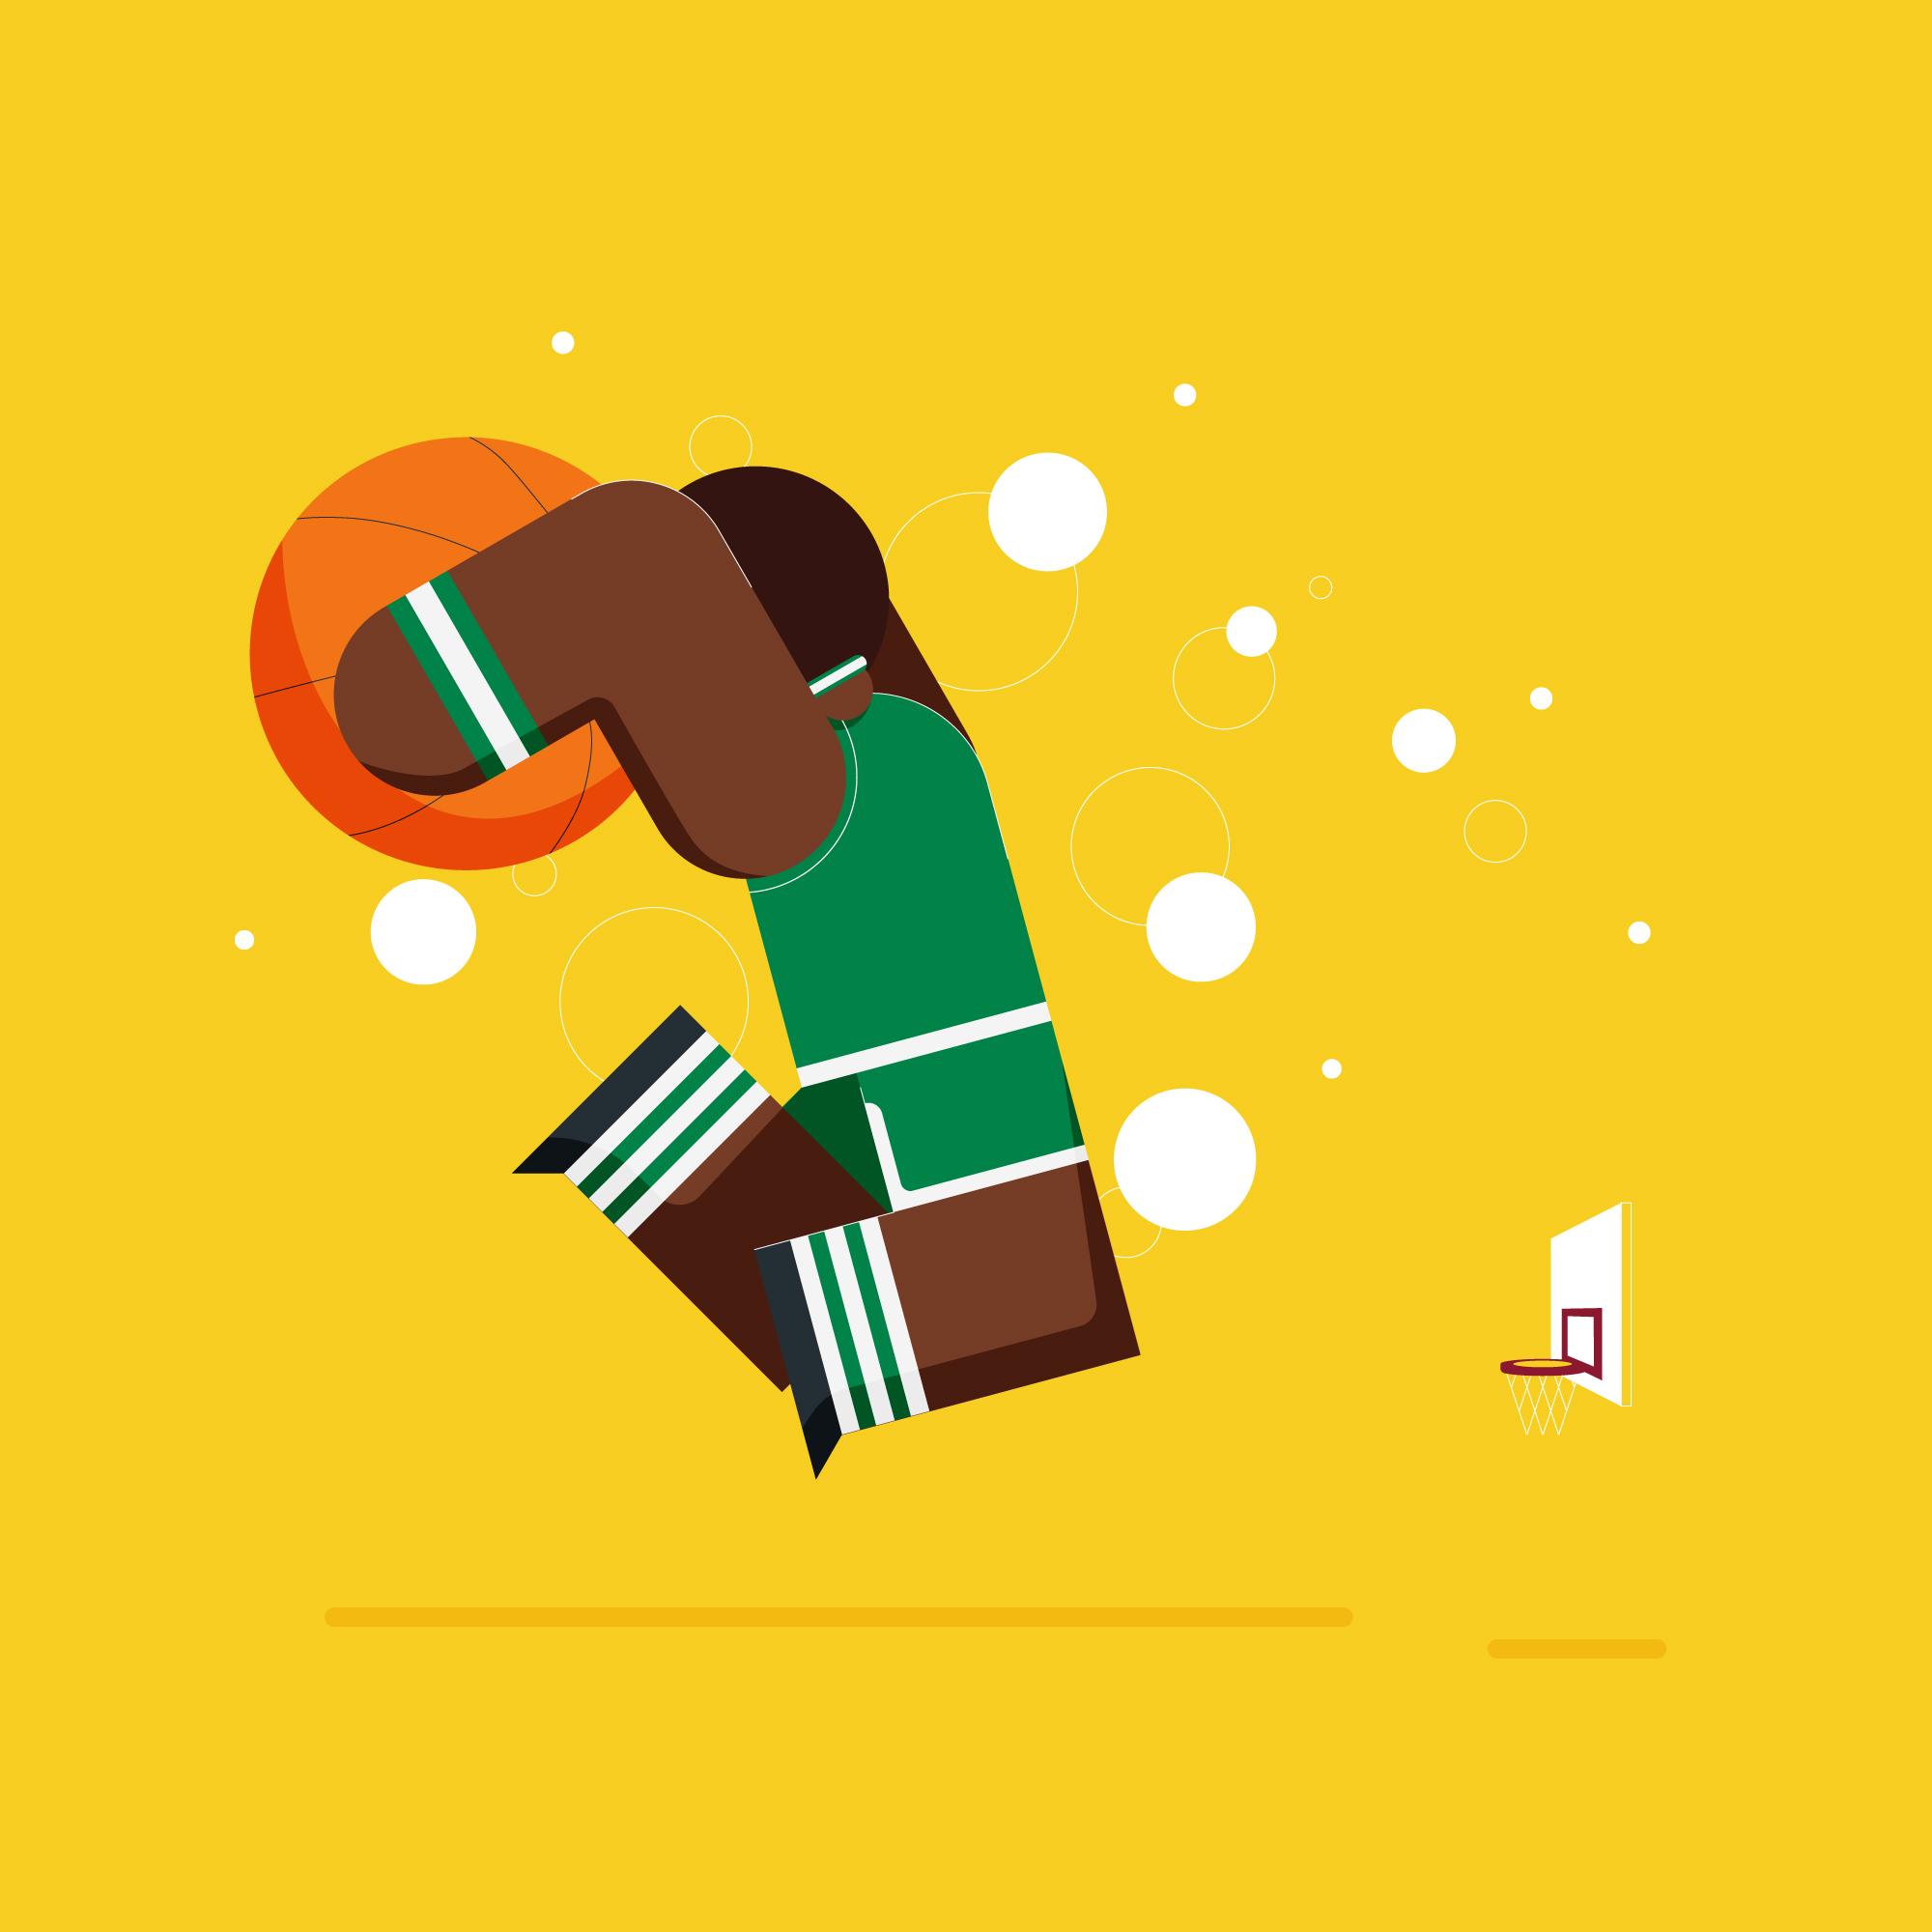 BigBuds_Basketball_Insta.jpg